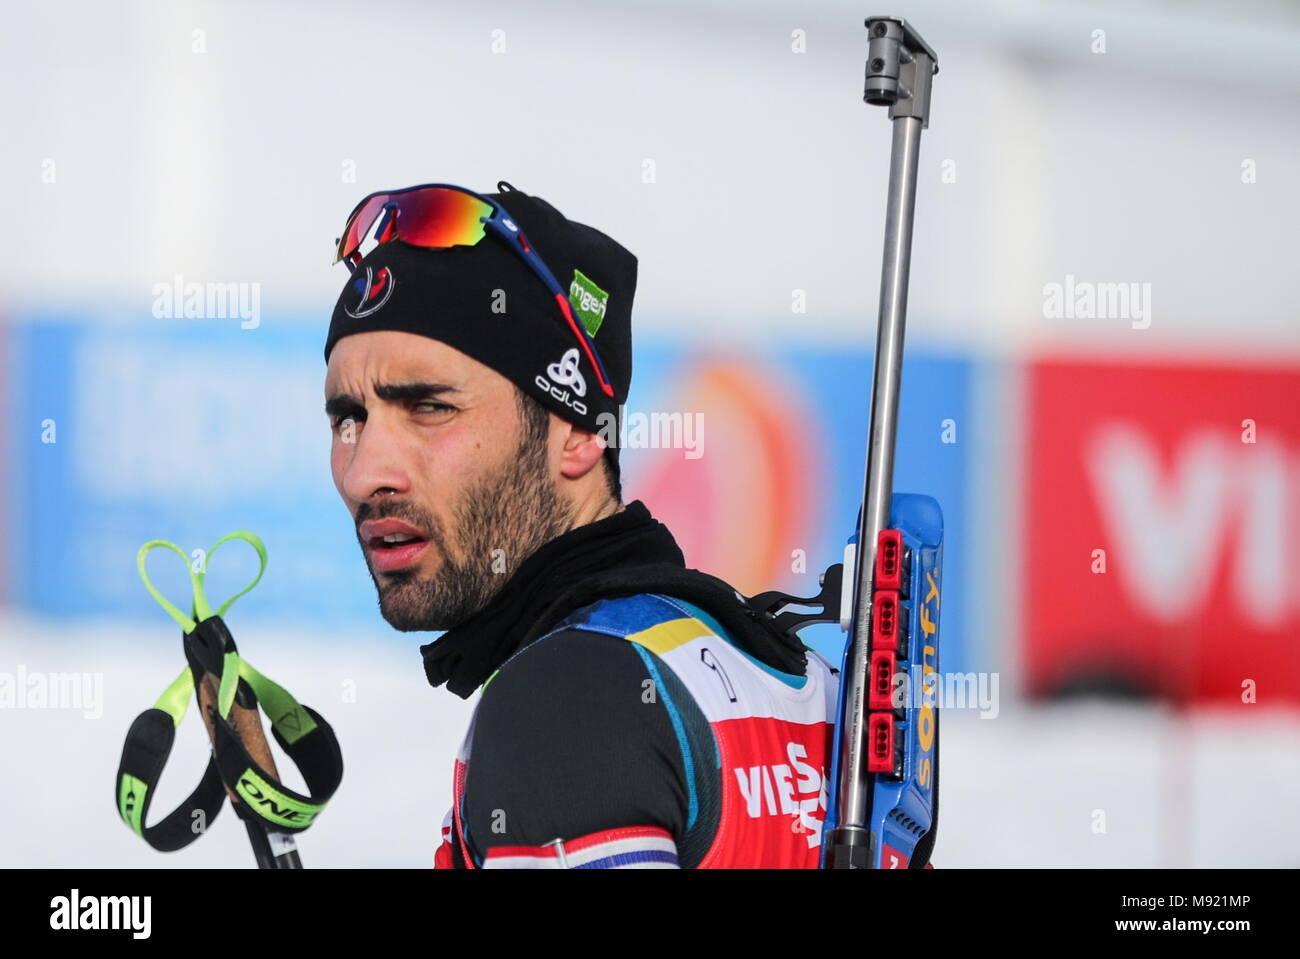 Biathlon in 2017-2018: World Cup 63